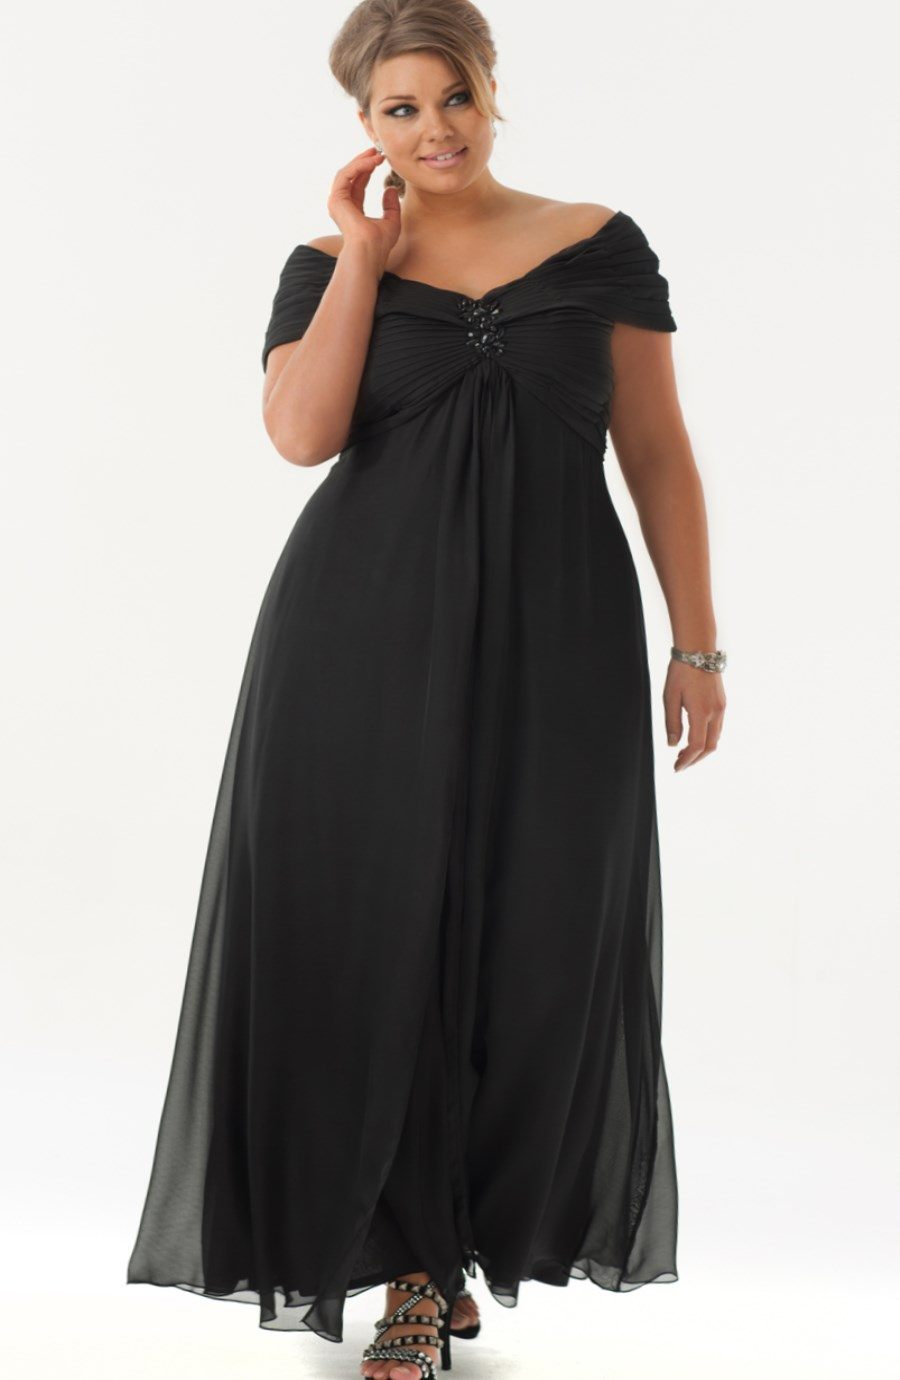 plus size elegant evening dresses photo - 1